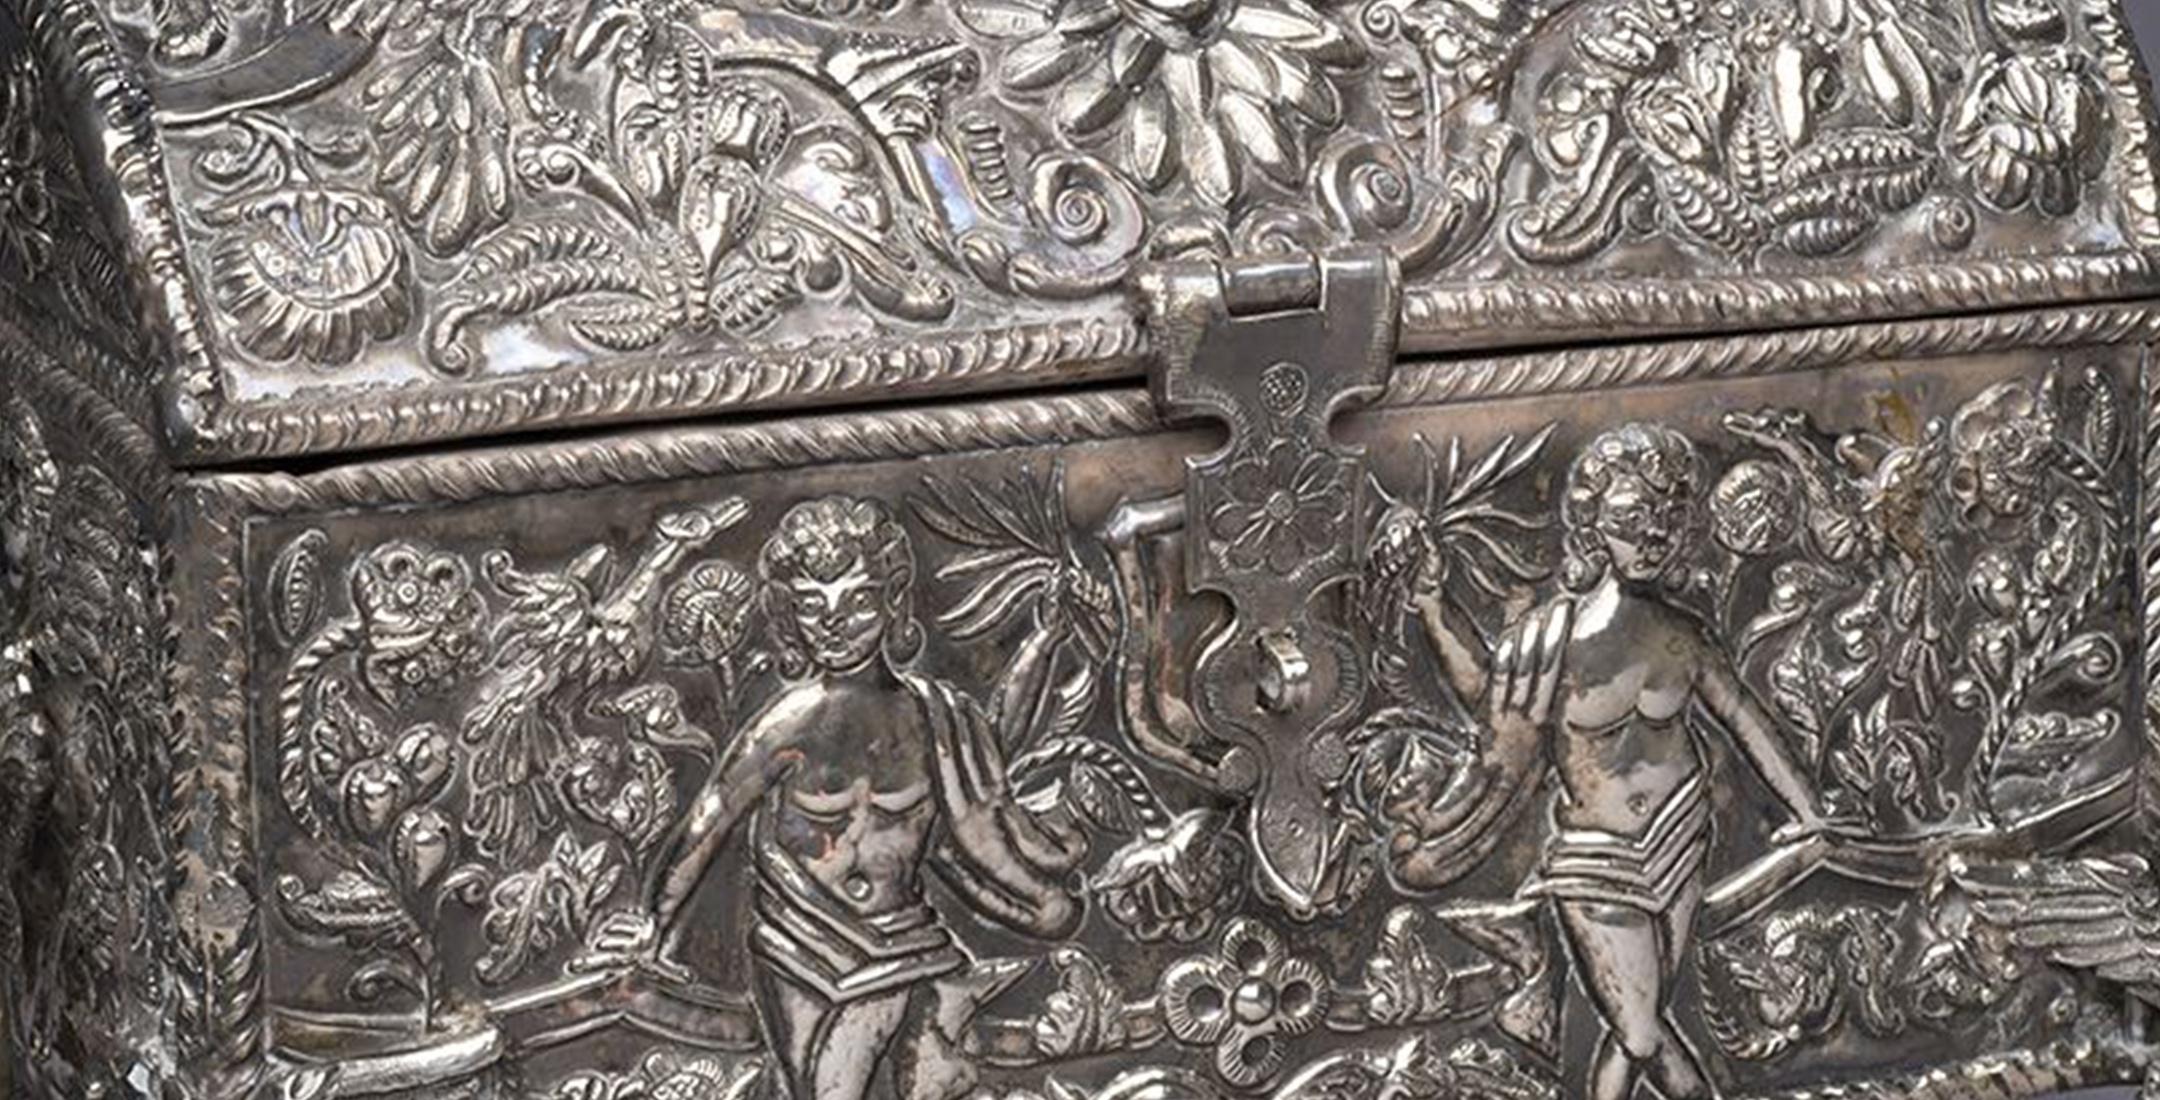 Arte y Fé | A Collection of Silver Boxes